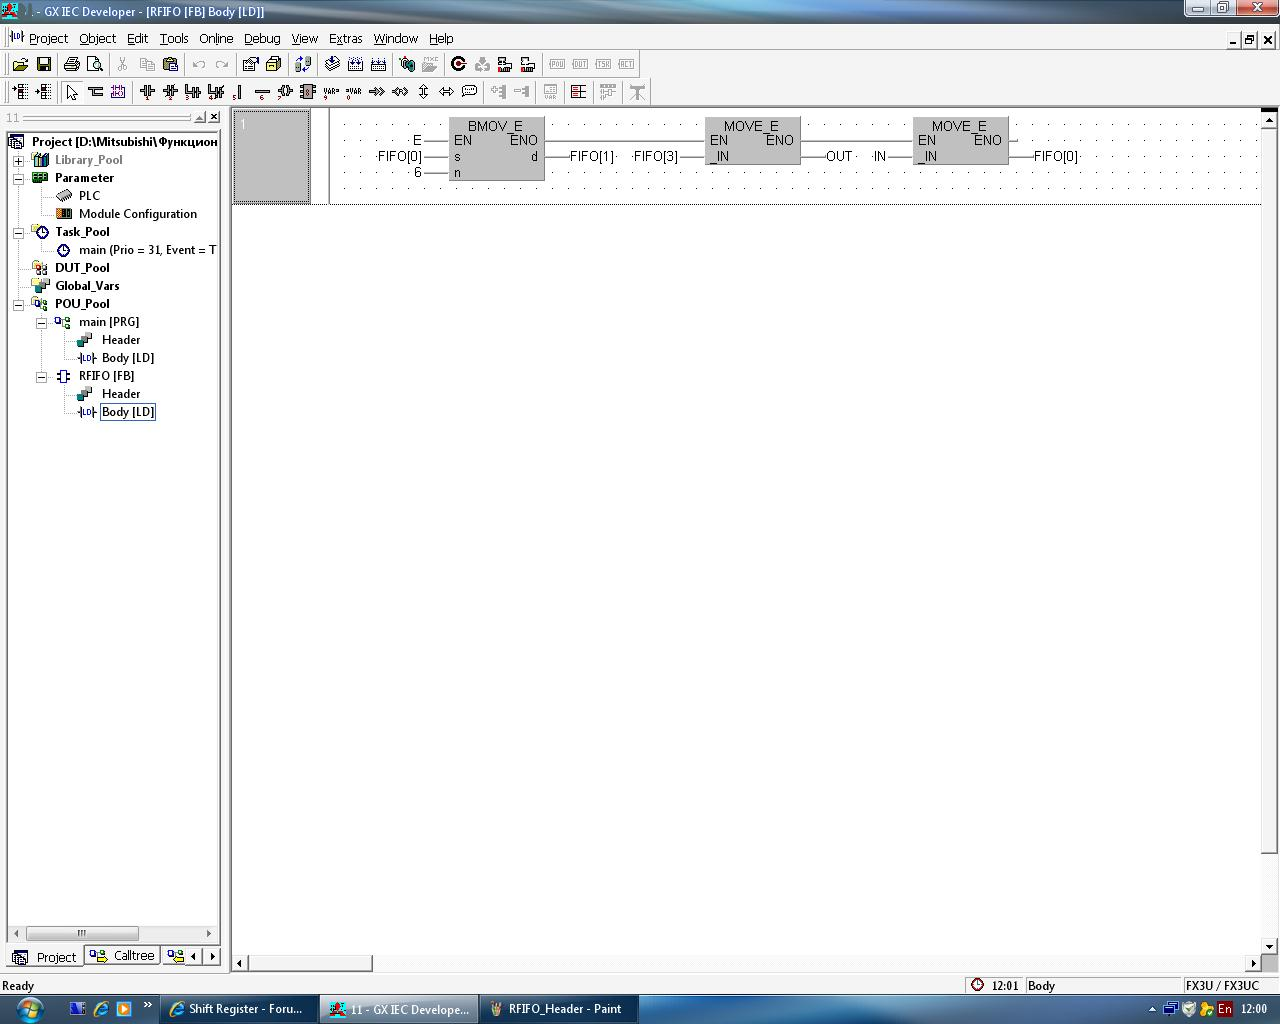 gx iec developer 7.04